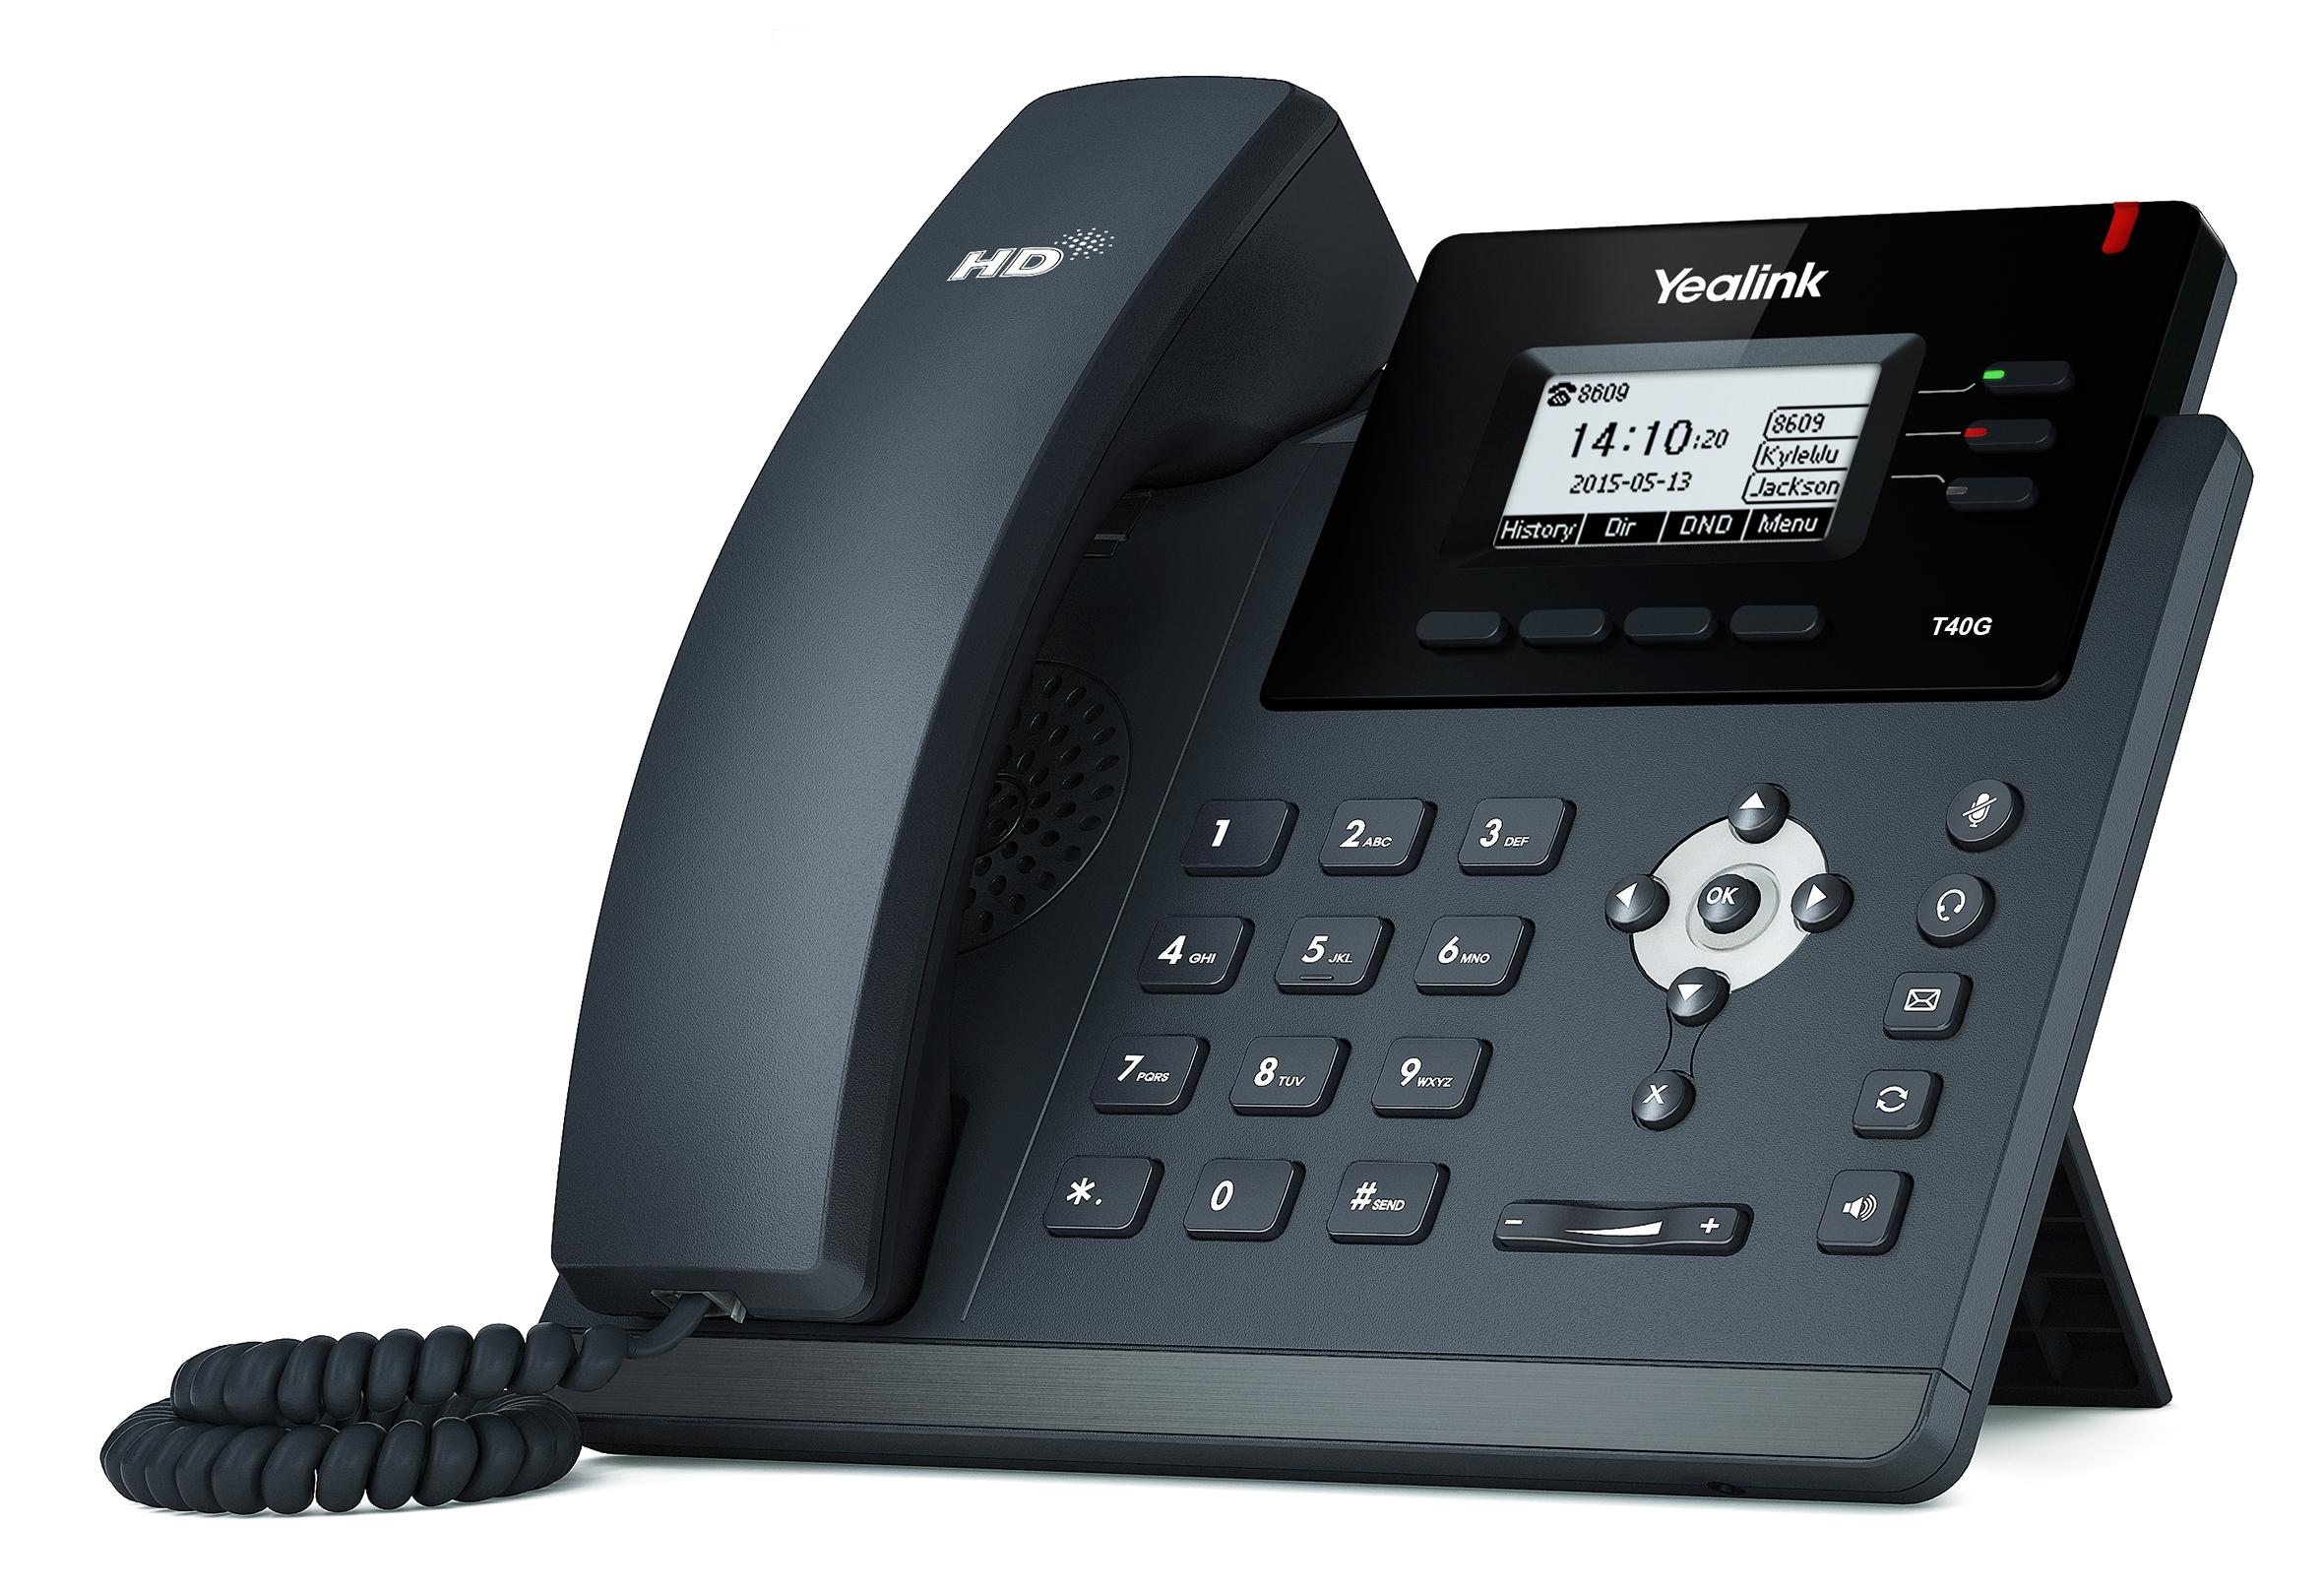 T40G טלפון IP יאלינק רשת